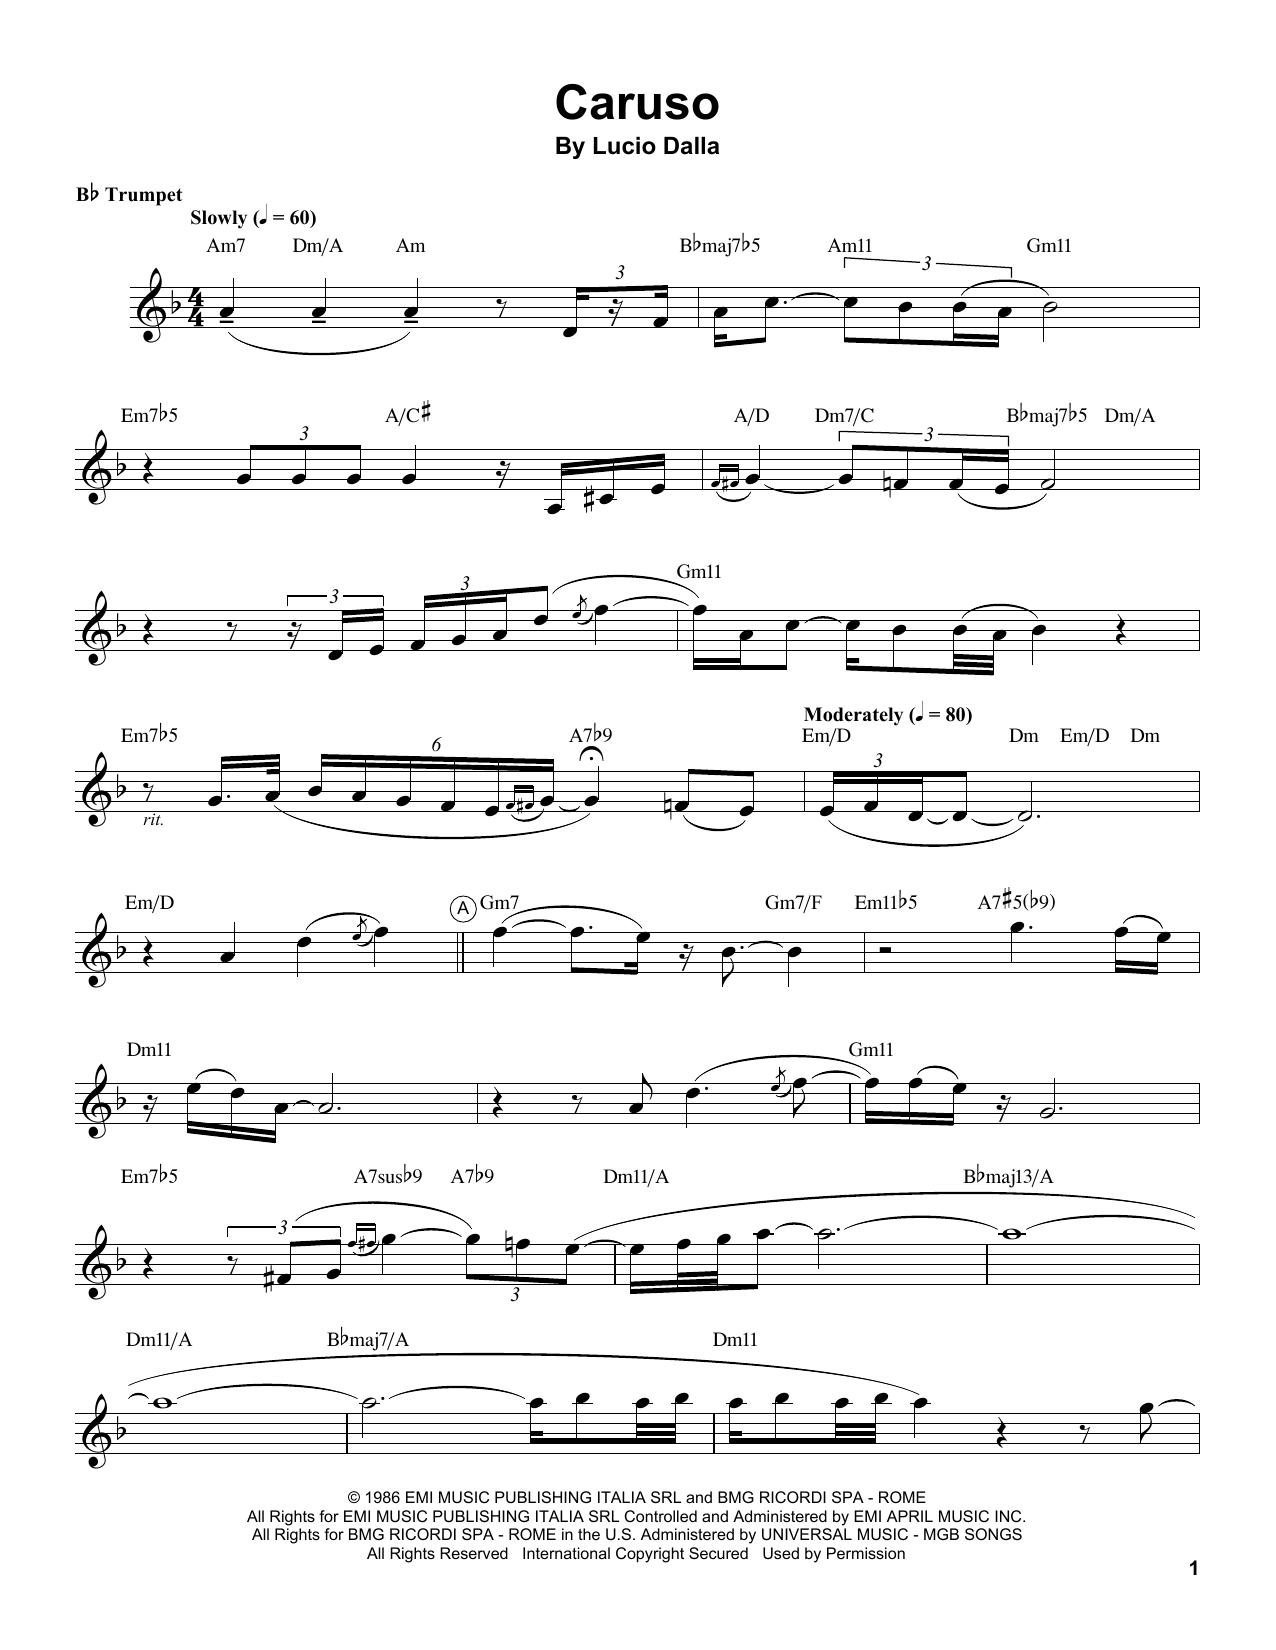 Chris Botti 'Caruso' Sheet Music Notes, Chords | Download Printable Trumpet  Transcription - SKU: 199027